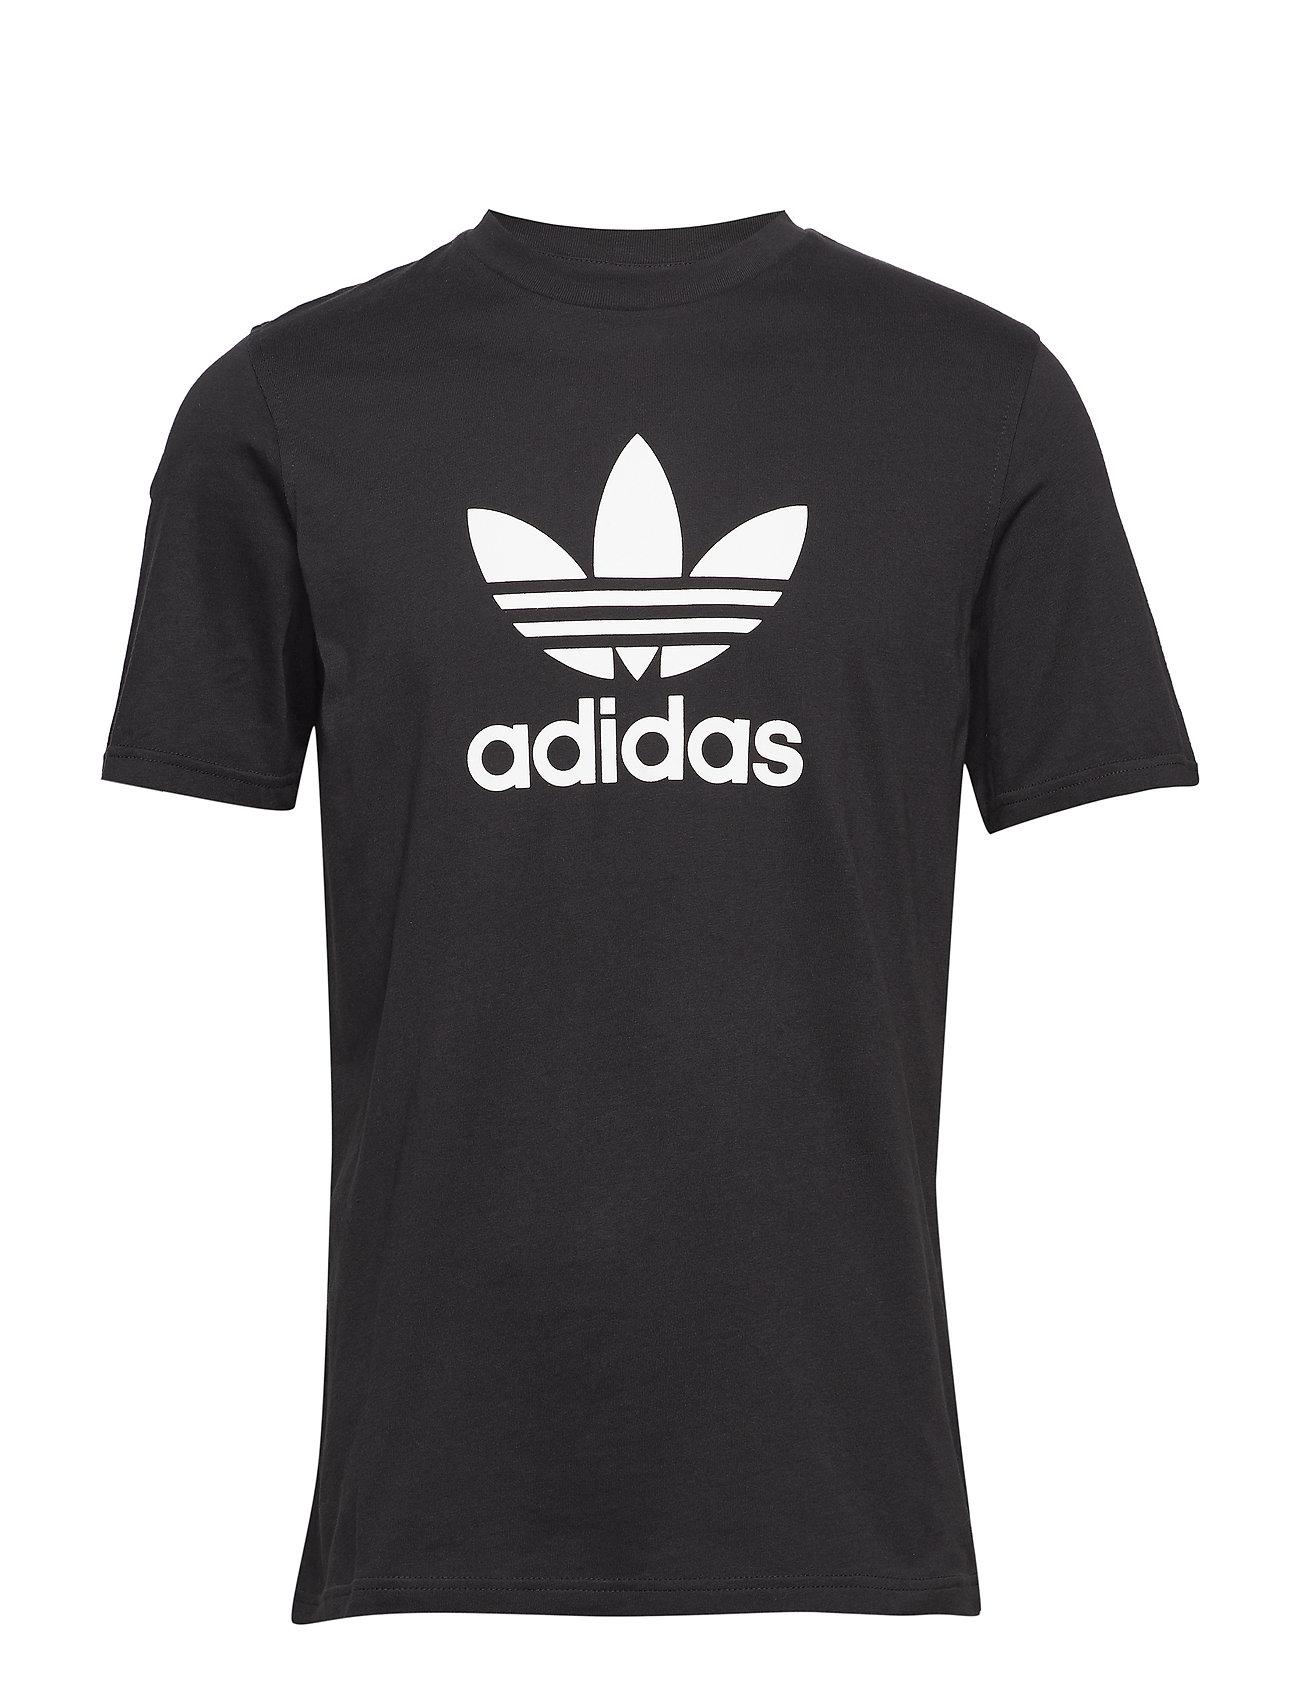 adidas Originals TREFOIL T-SHIRT - BLACK